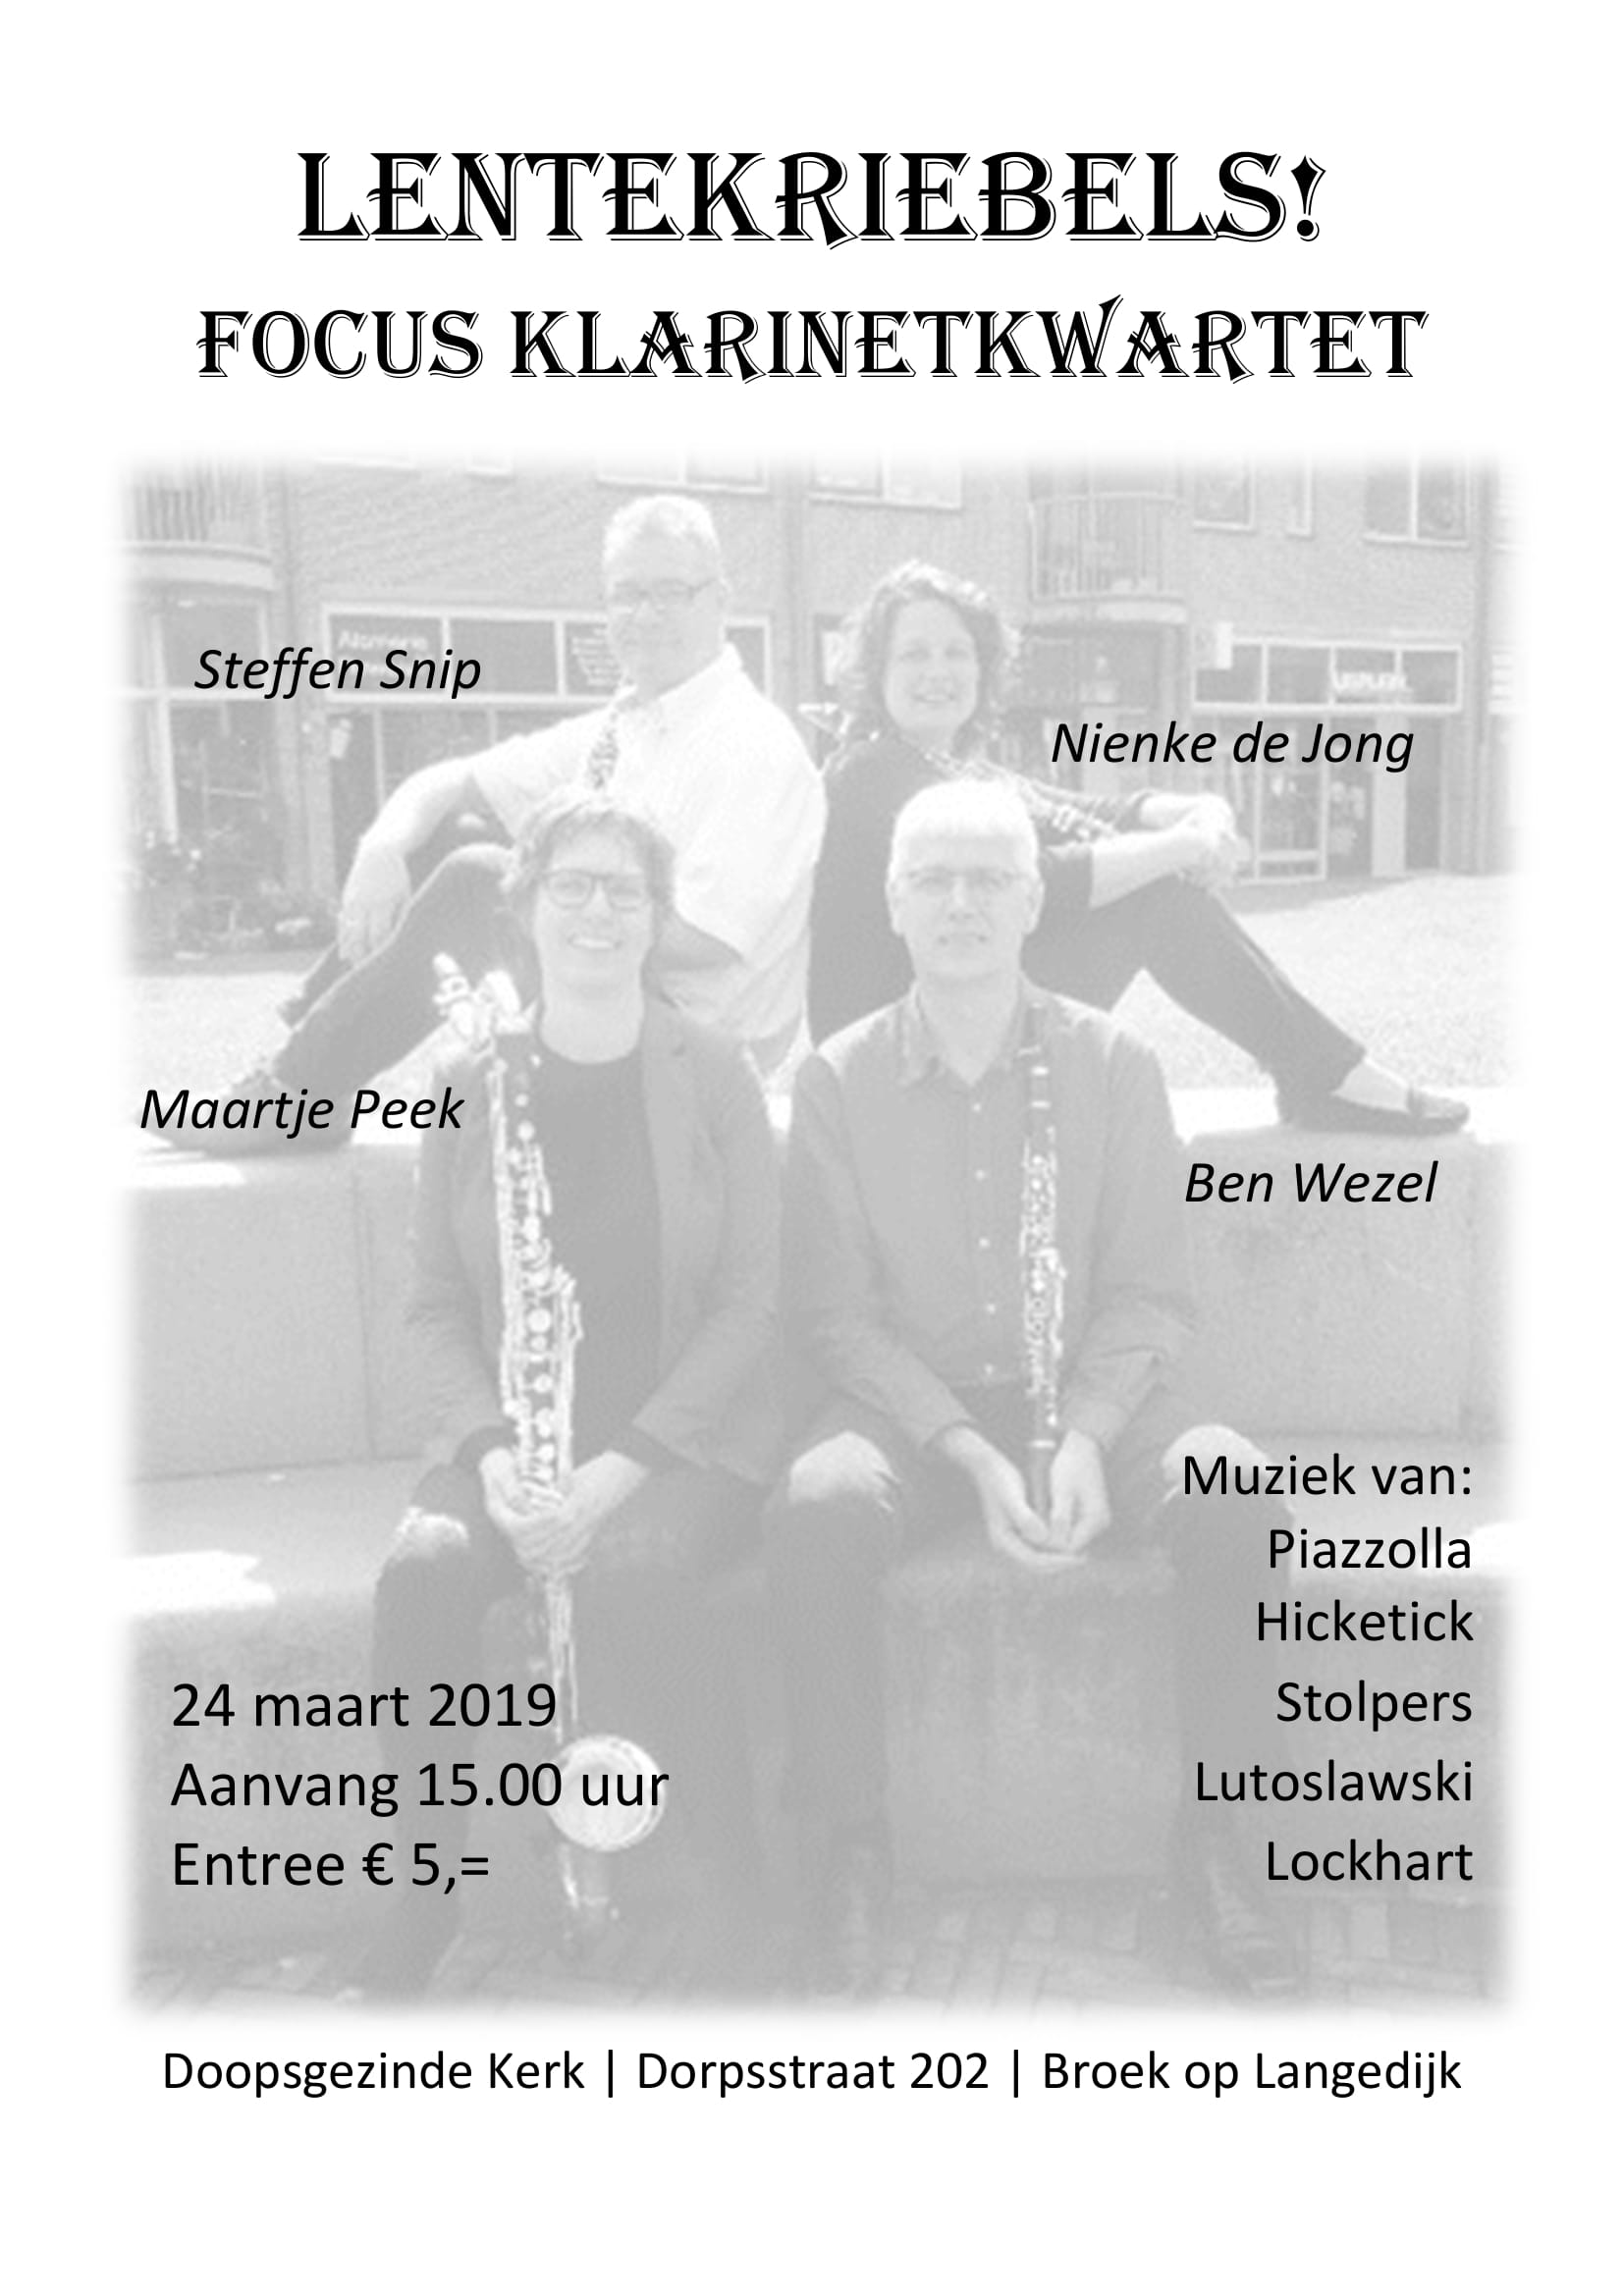 Focus klarinetkwartet 24 maart 2019 Lentekriebels